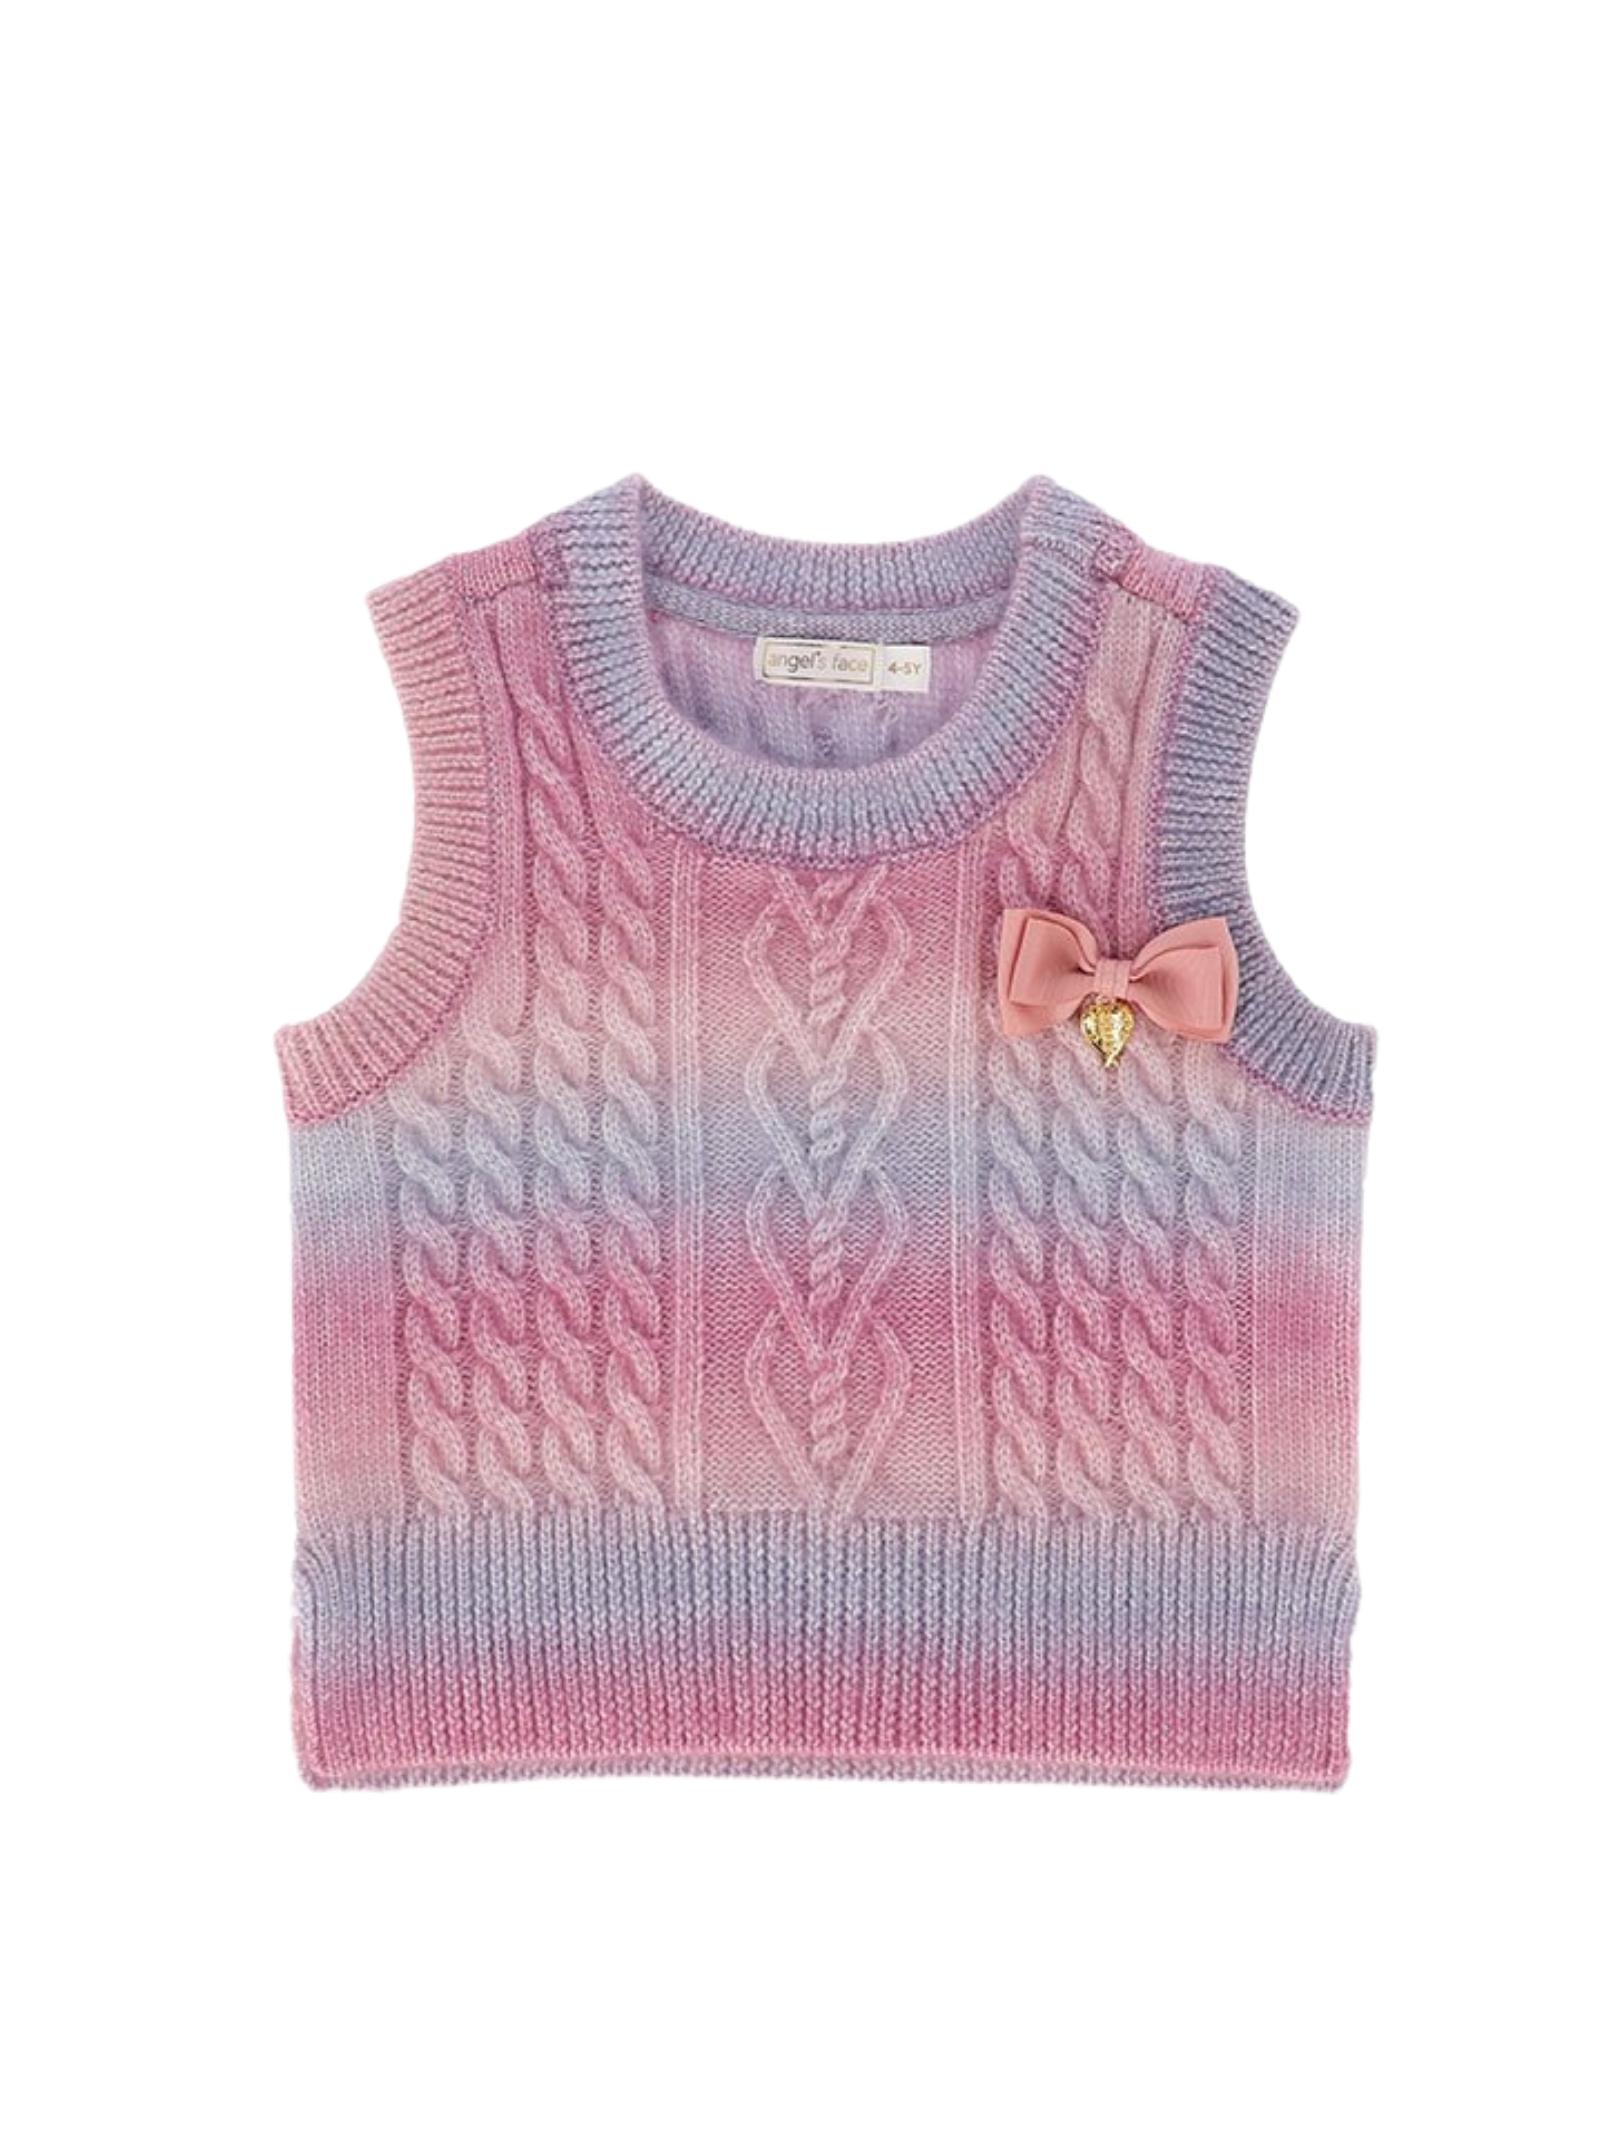 Pritty Rainbow Girl Sweater ANGEL'S FACE | Sweaters | PRITTIRAINBOW